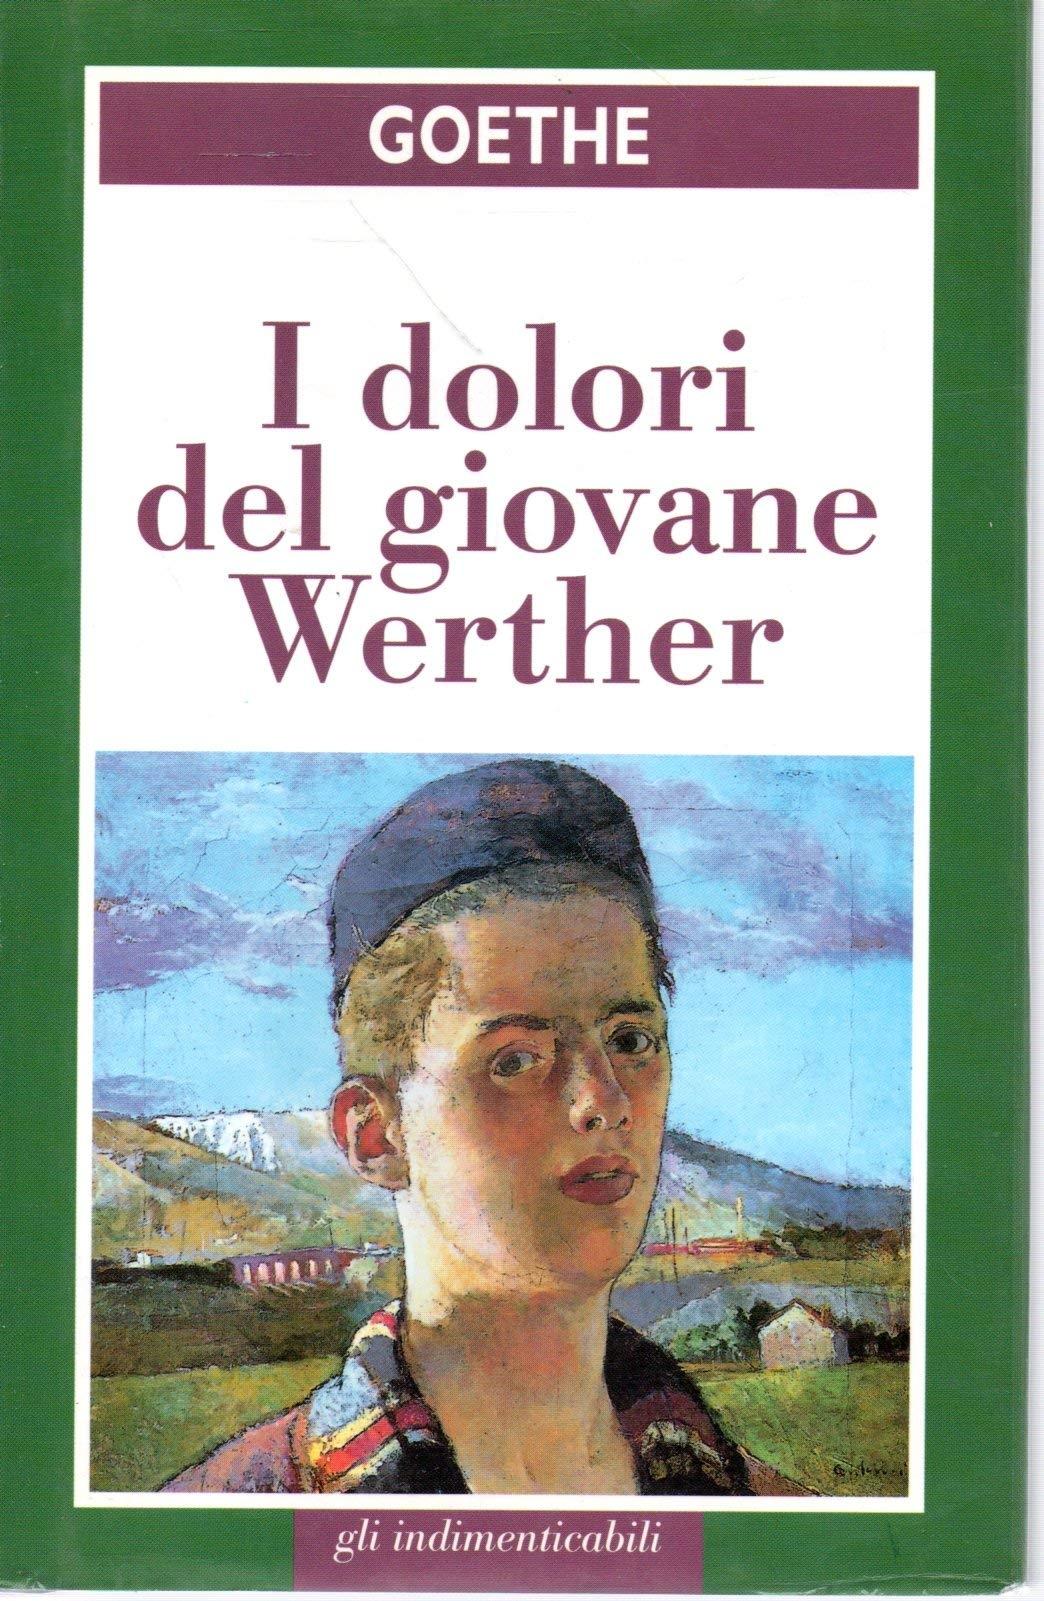 Goethe. I Dolori del Giovane Werther.